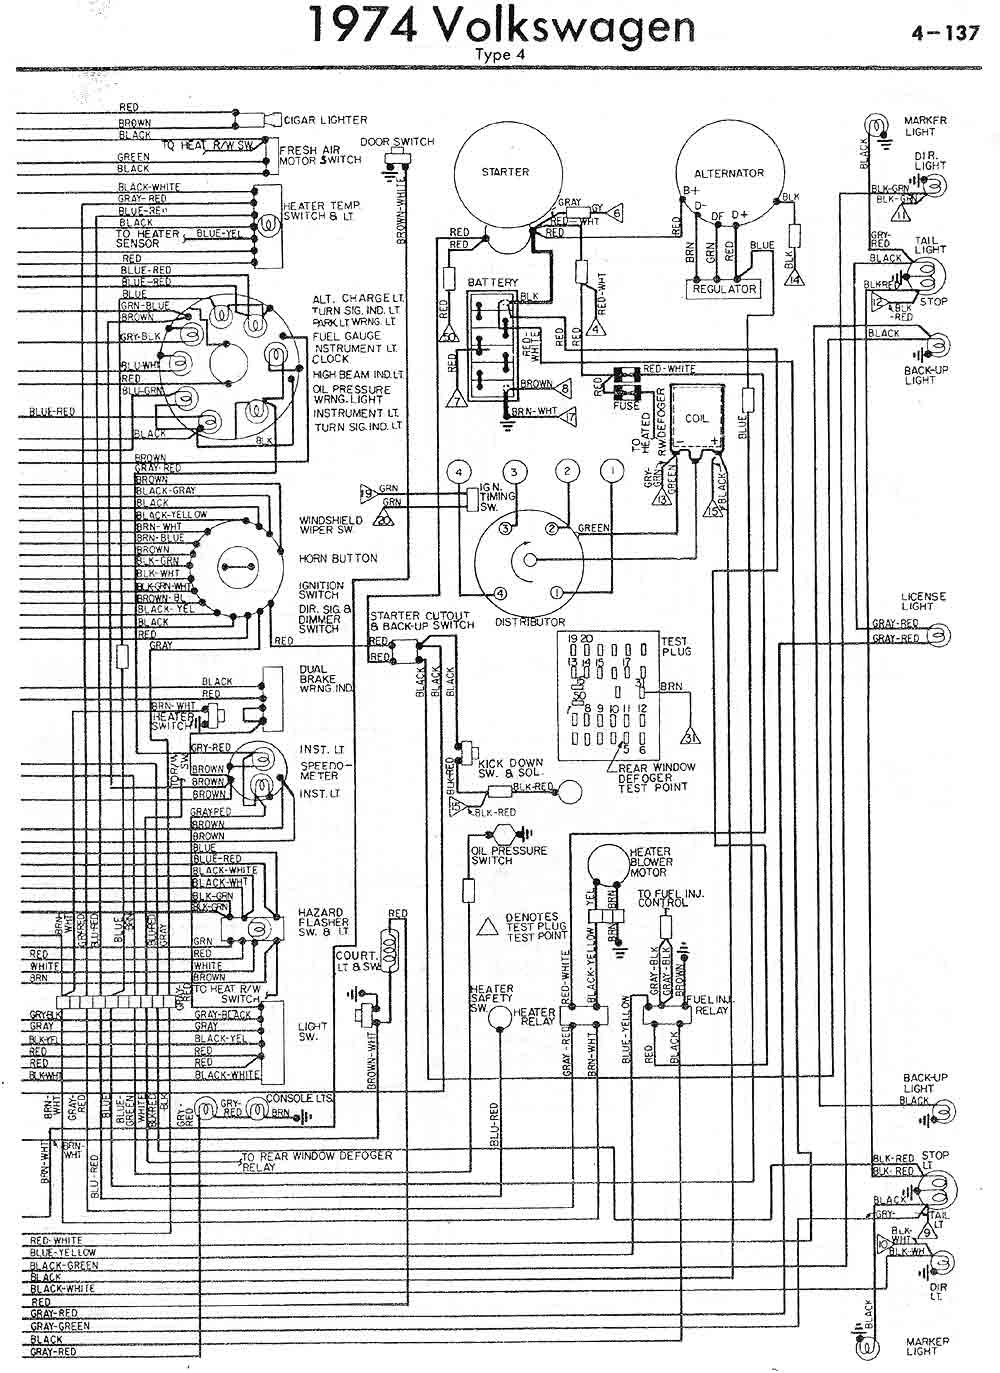 wiring diagrams type4 org us model 412 model year 1974 part 2